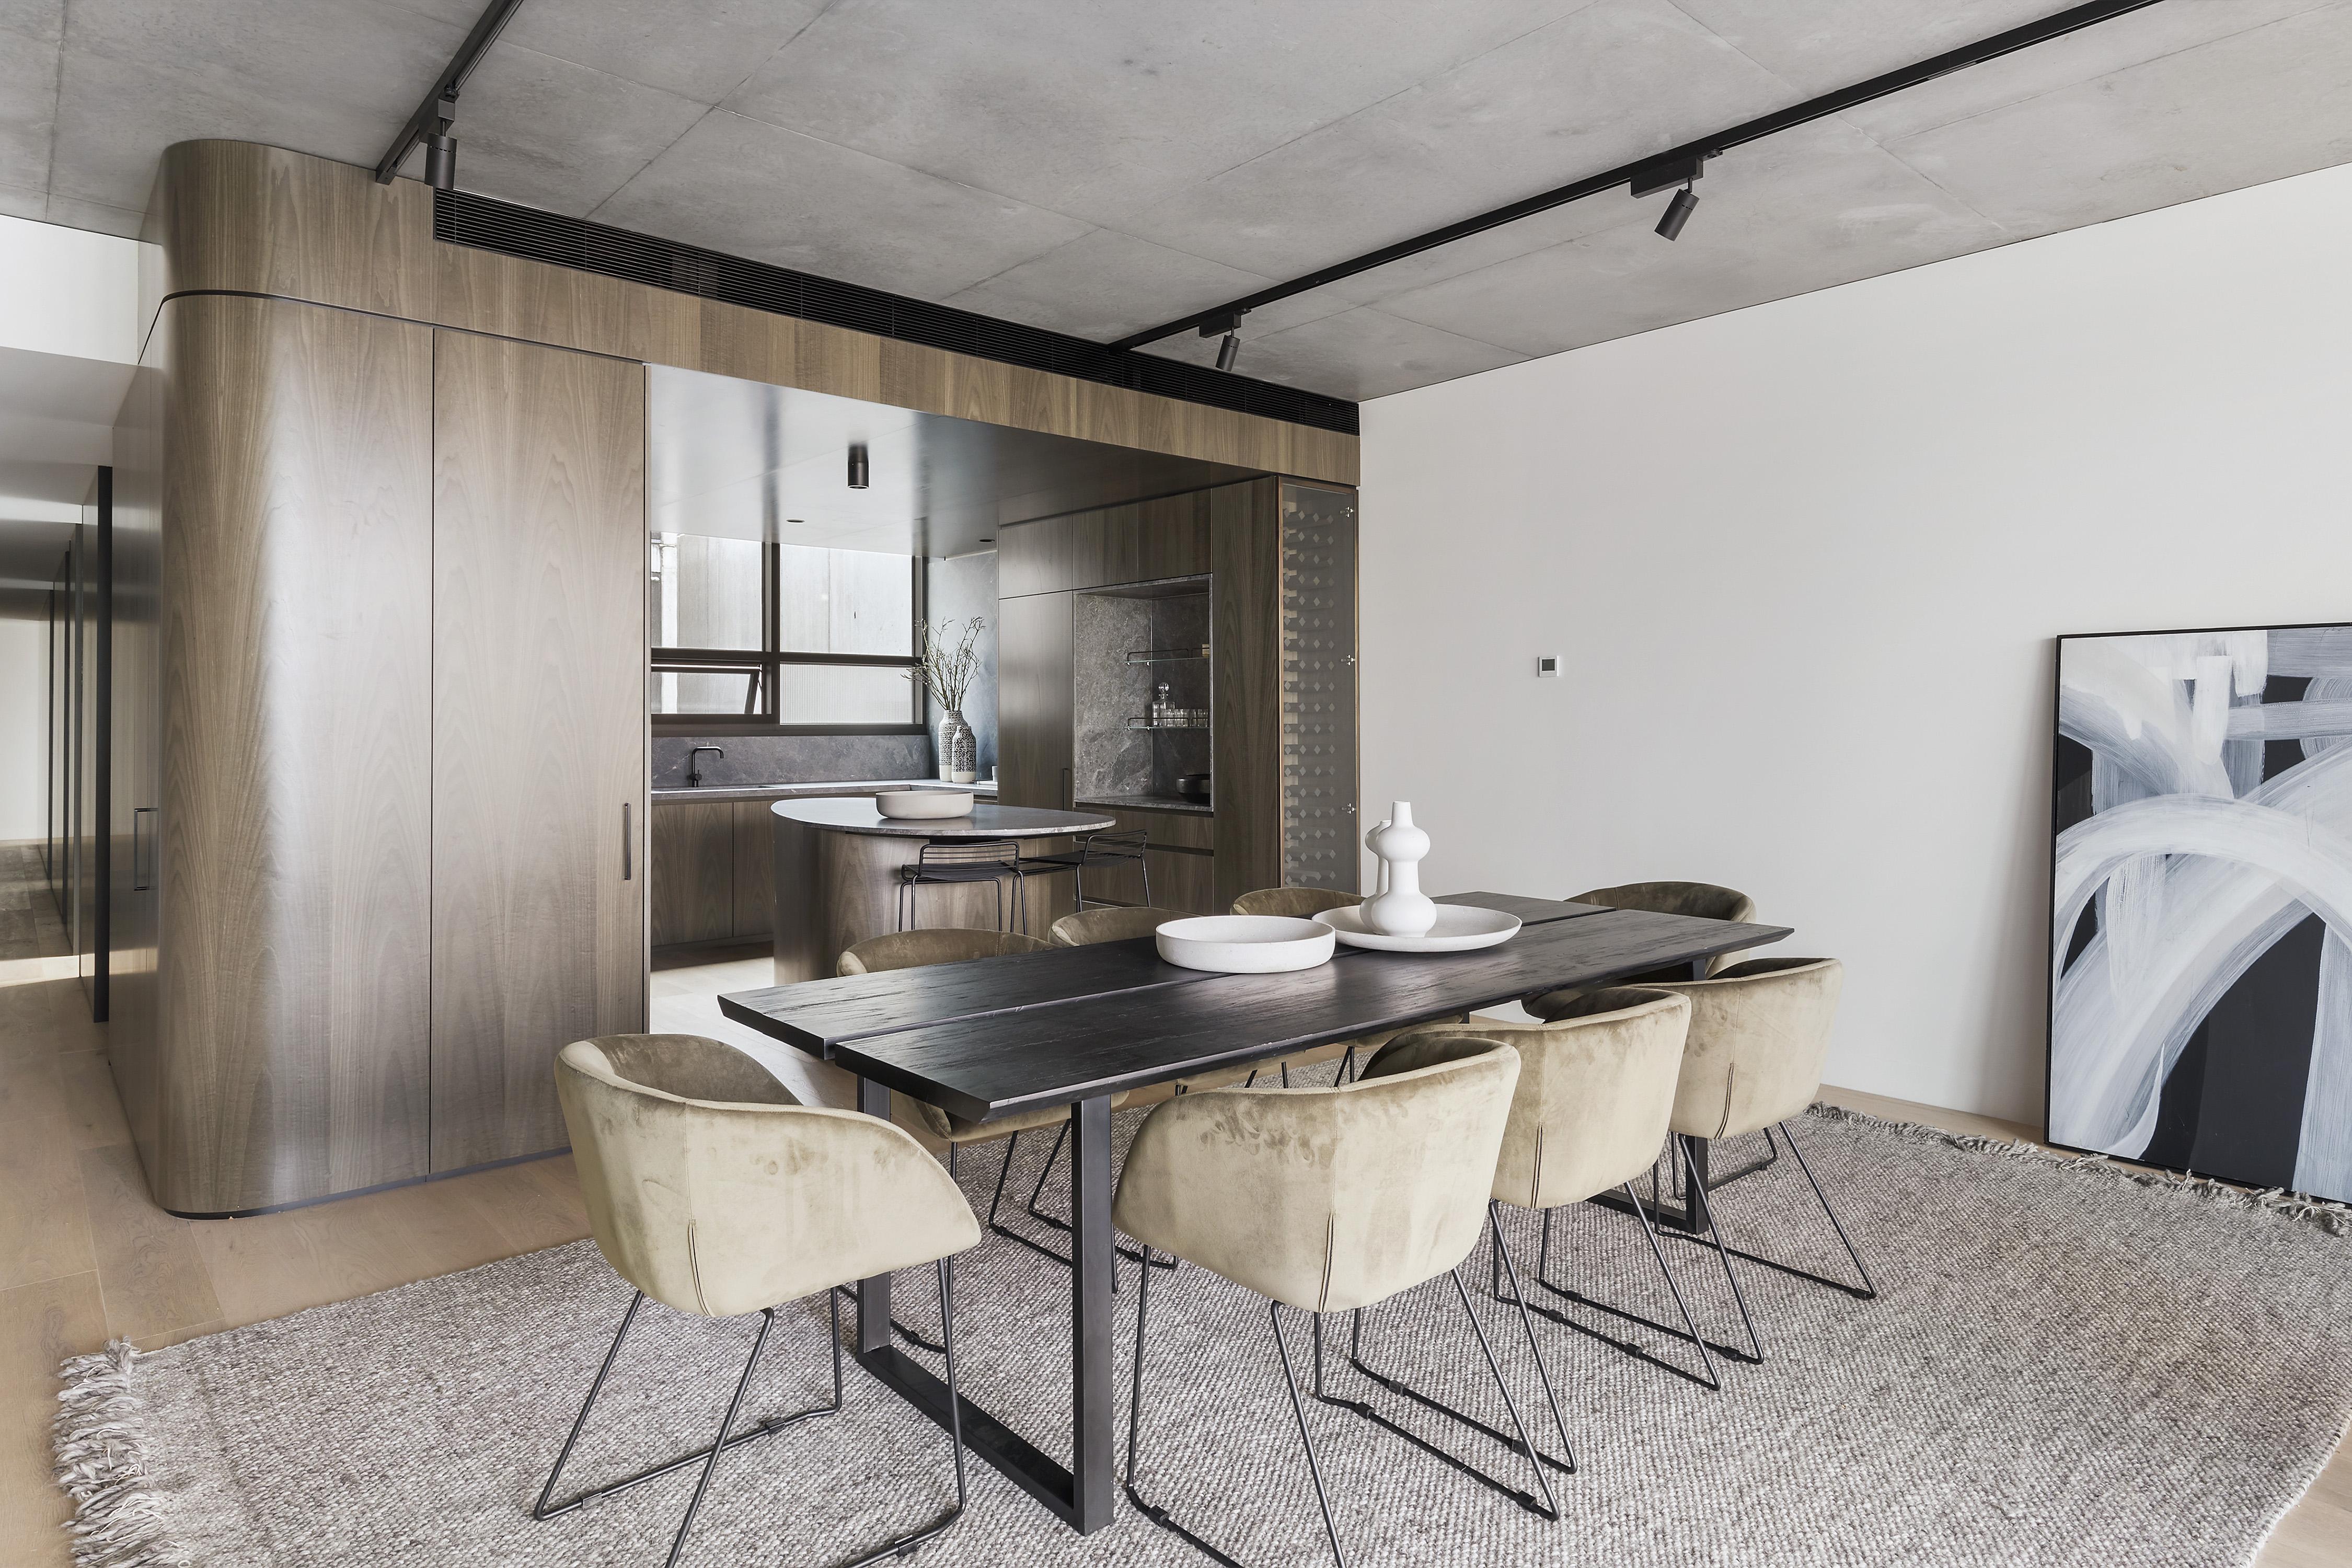 405-9-johnston-street-port-melbourne-student-accommodation-Melbourne-Dining-Area-Unilodgers